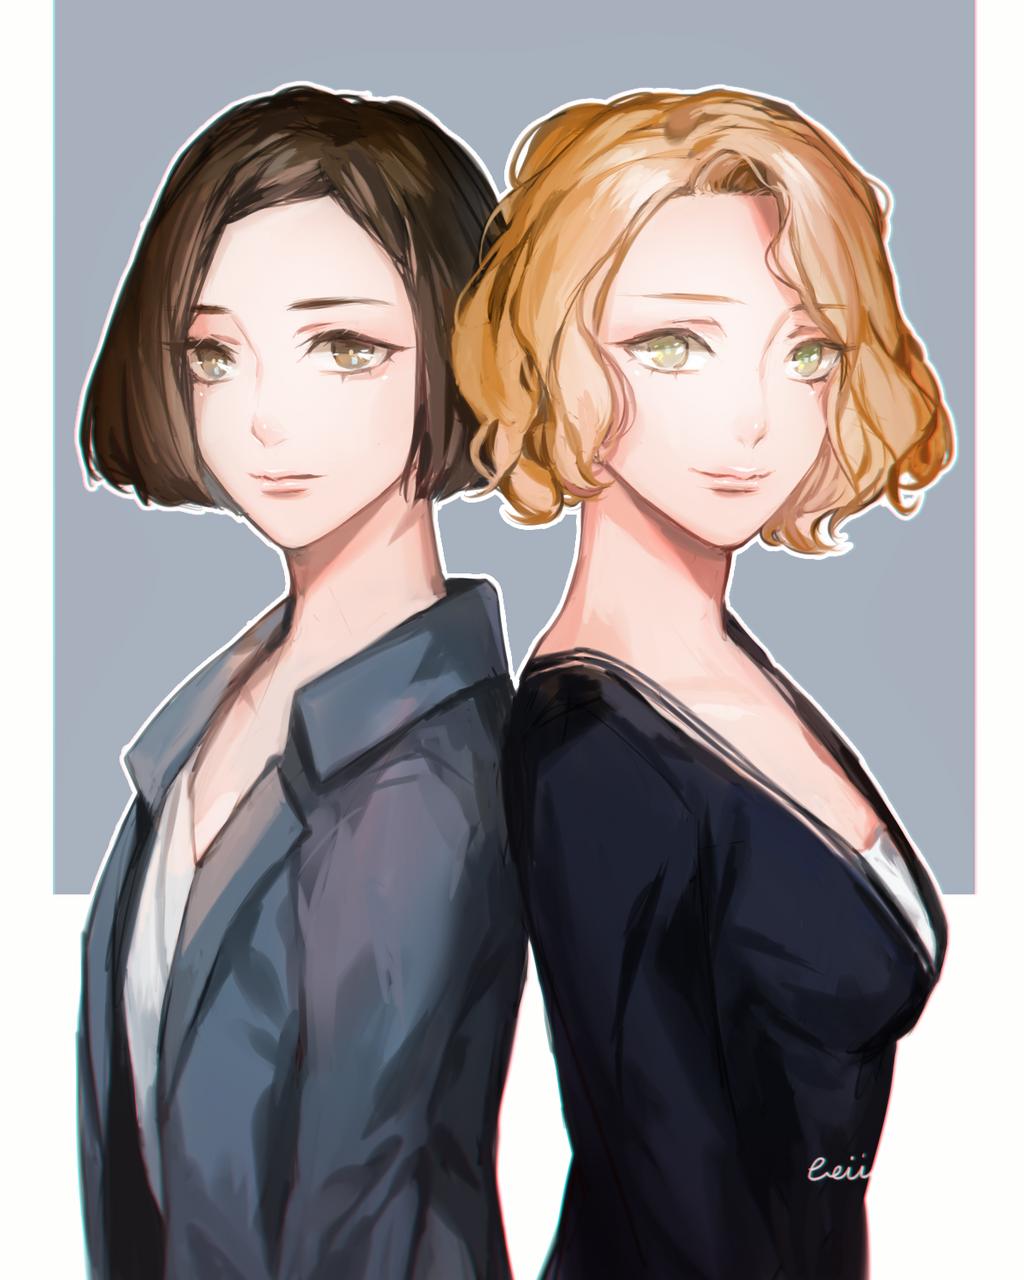 Goldstein Sisters By Beii Ac On Deviantart